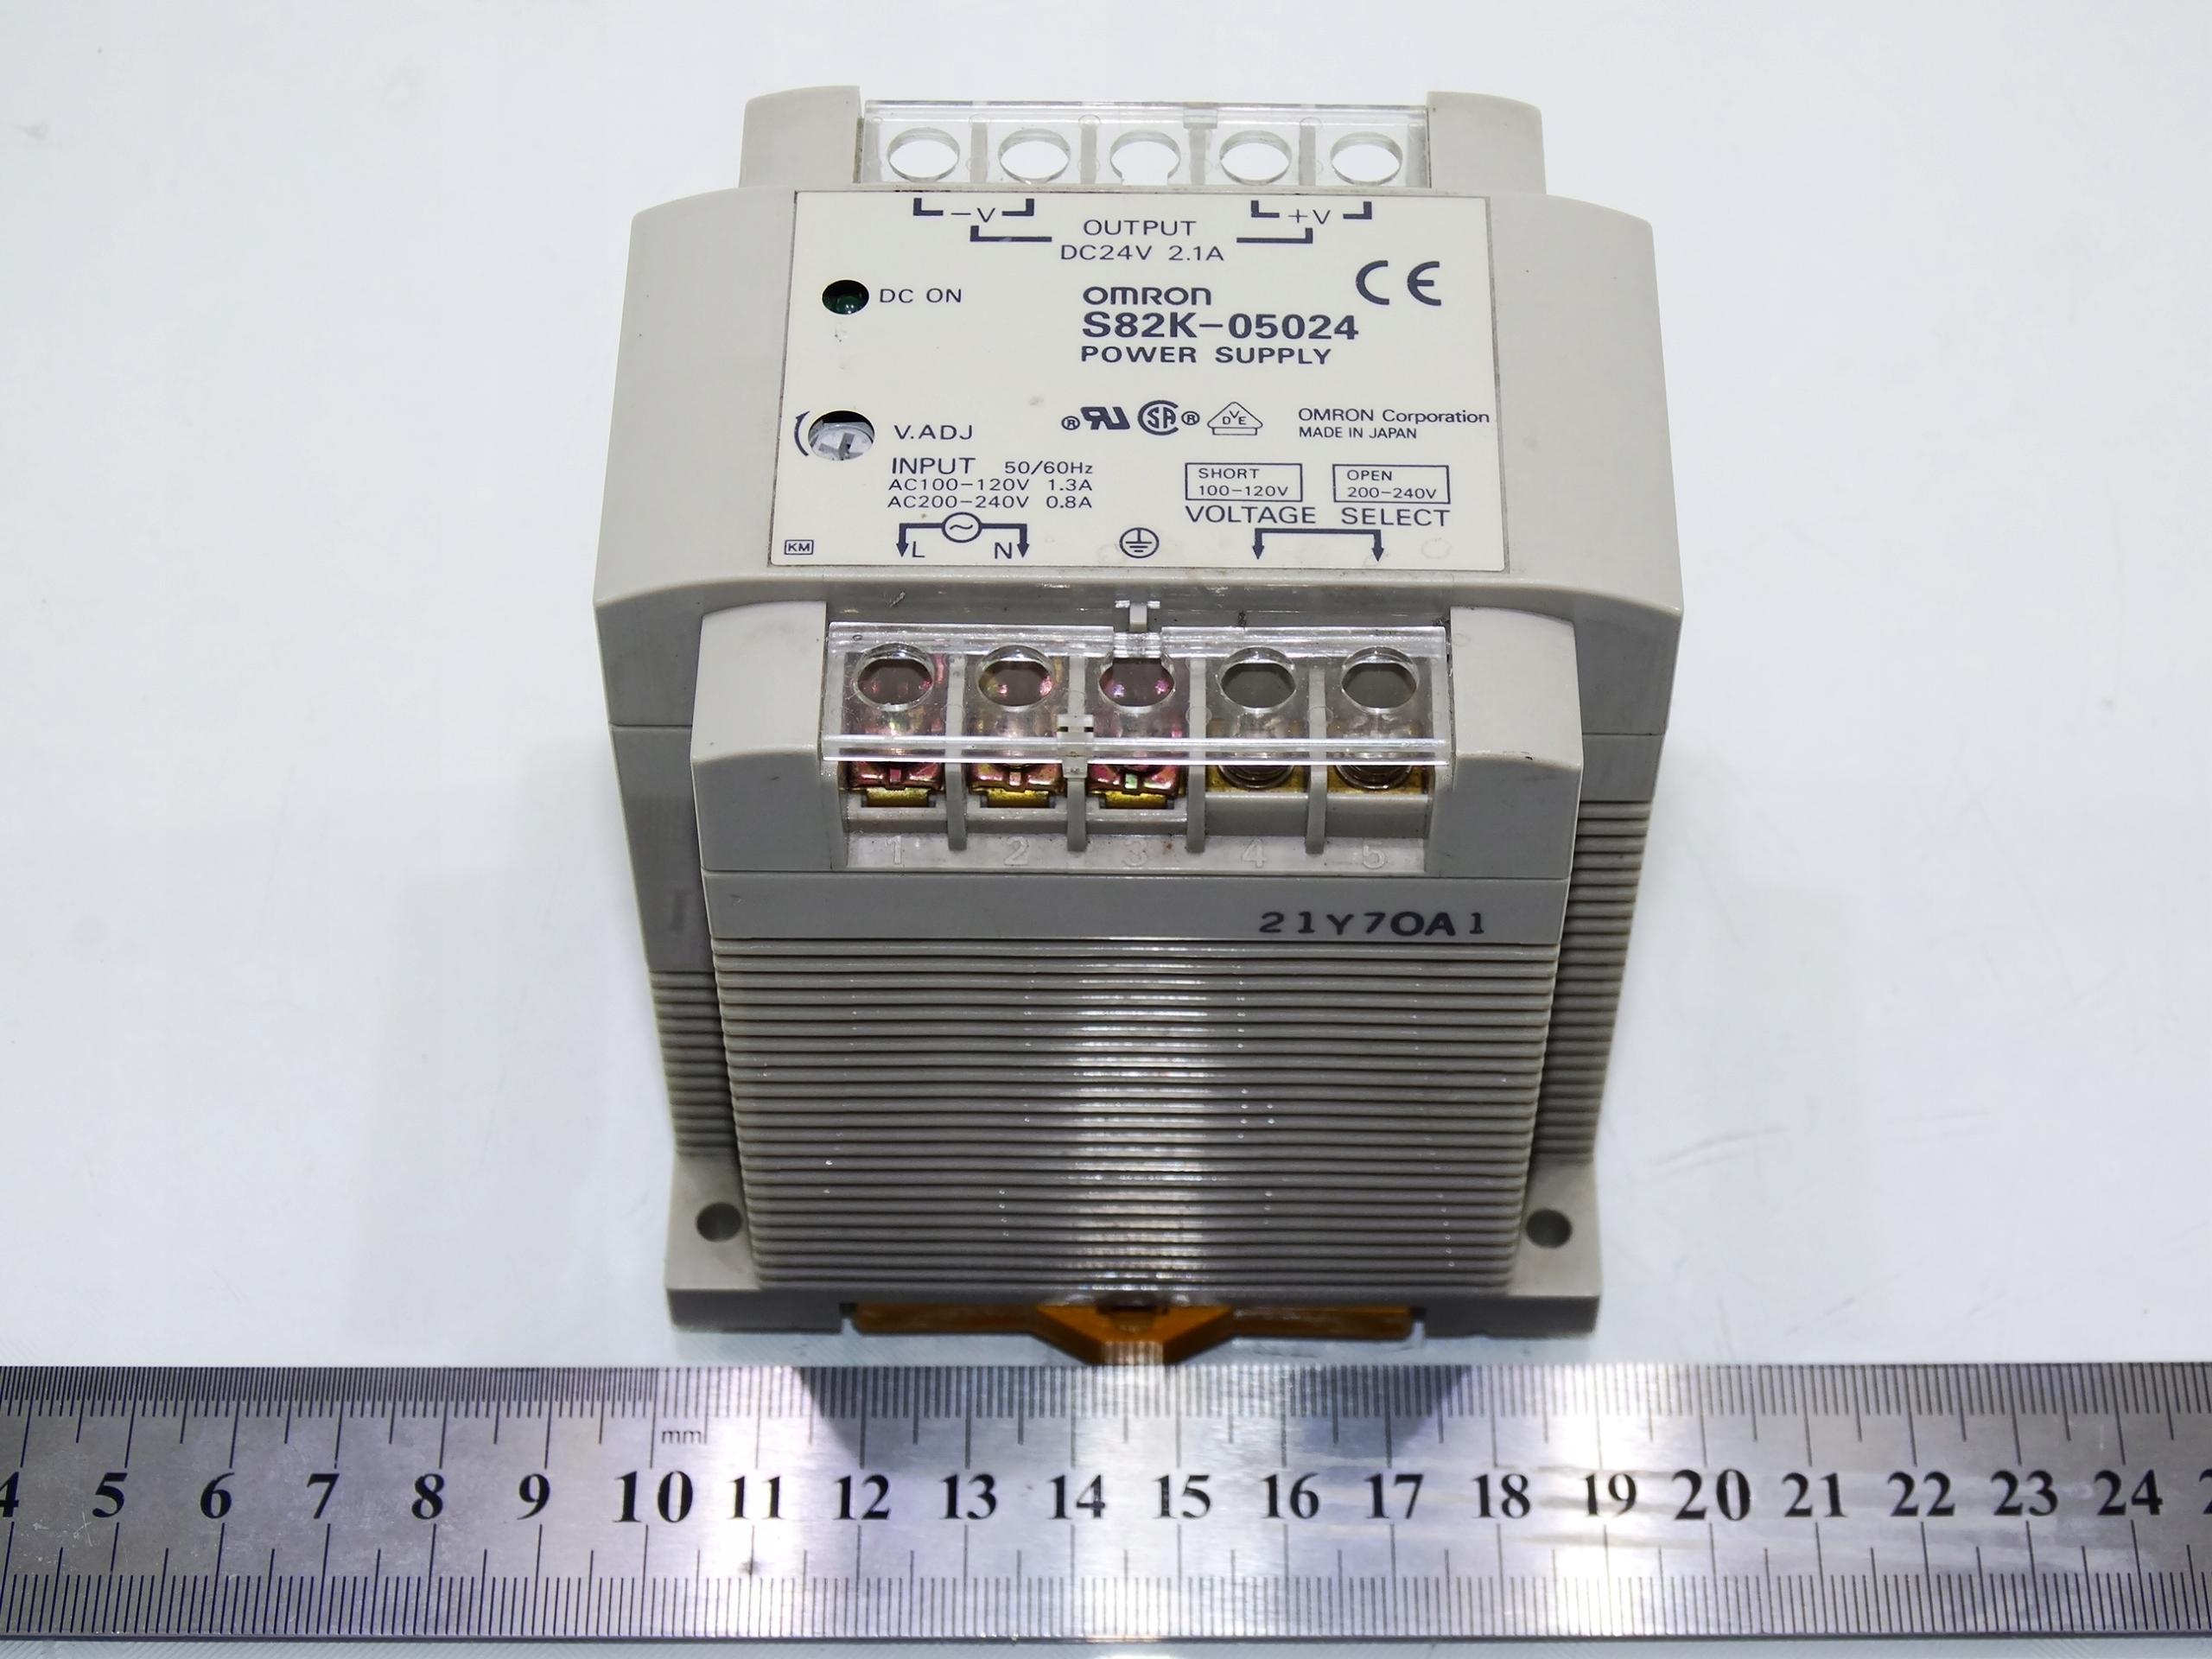 Zasilacz Omron S82K-05024 / 24 VDC / 2,1A